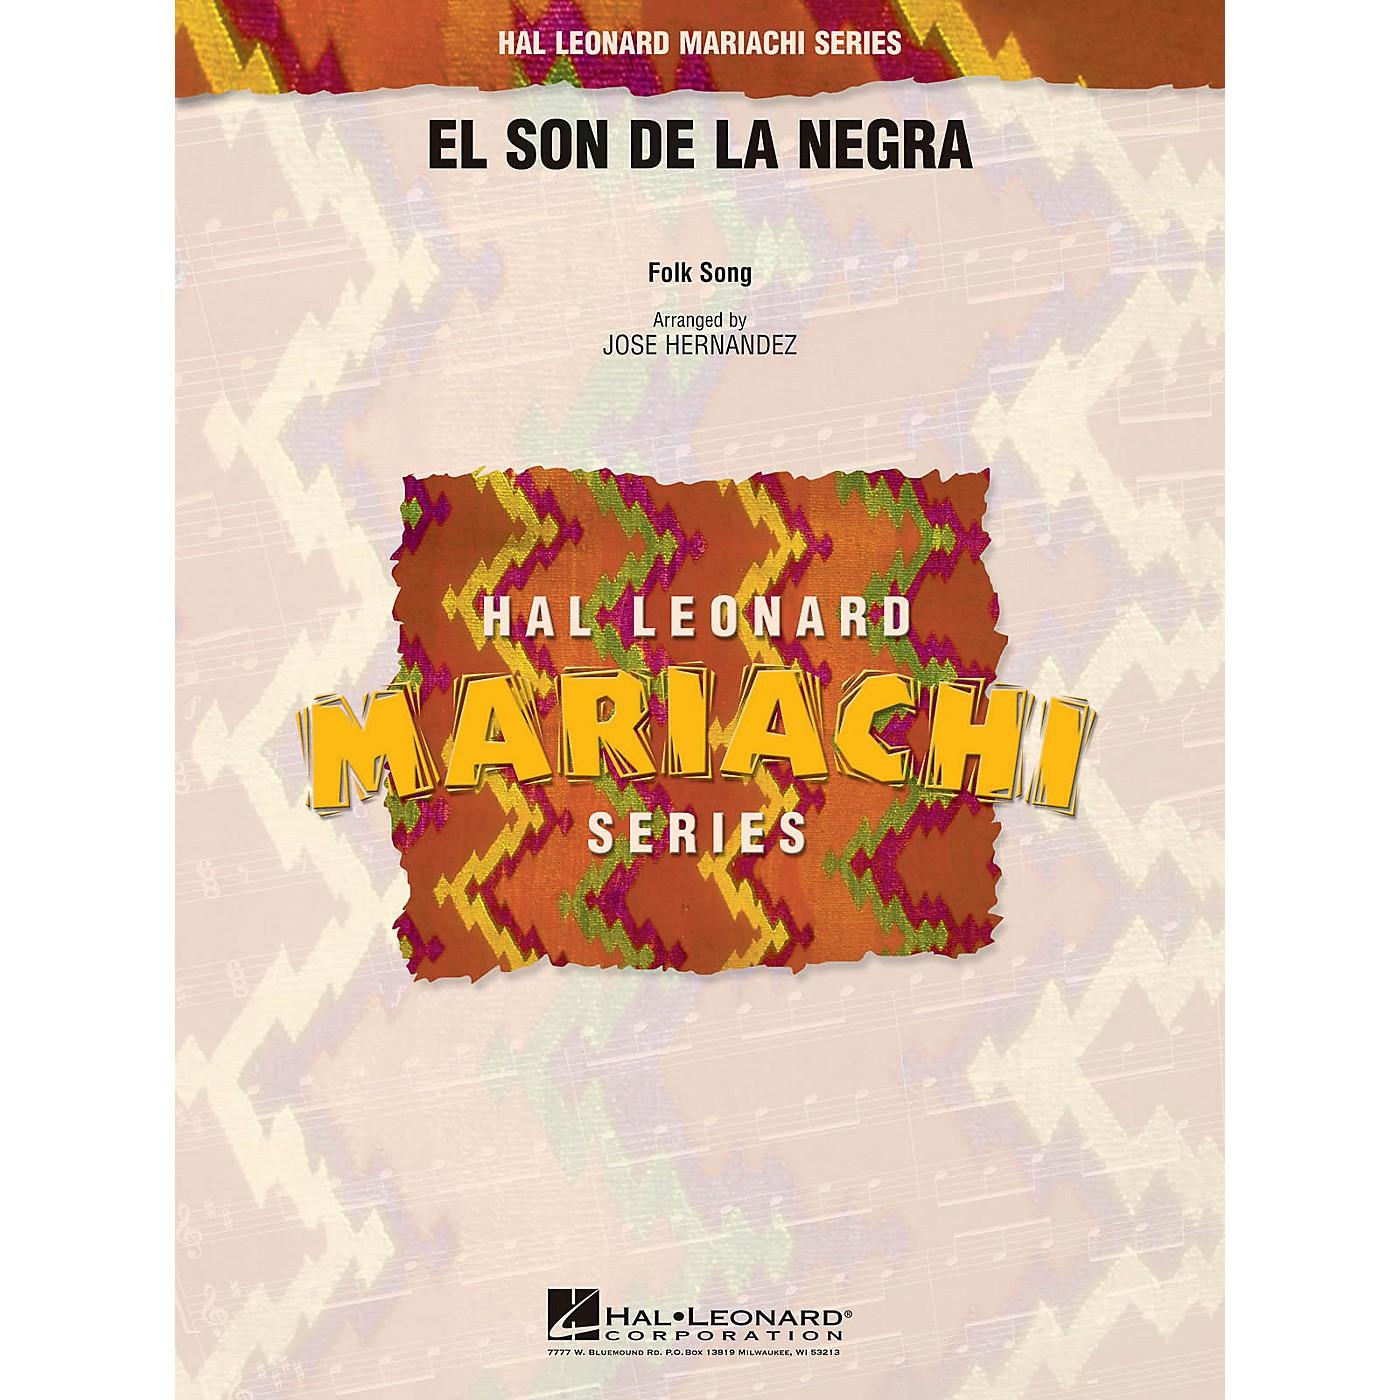 Hal Leonard El Son de la Negra Concert Band Level 4 Arranged by Jose Hernandez thumbnail